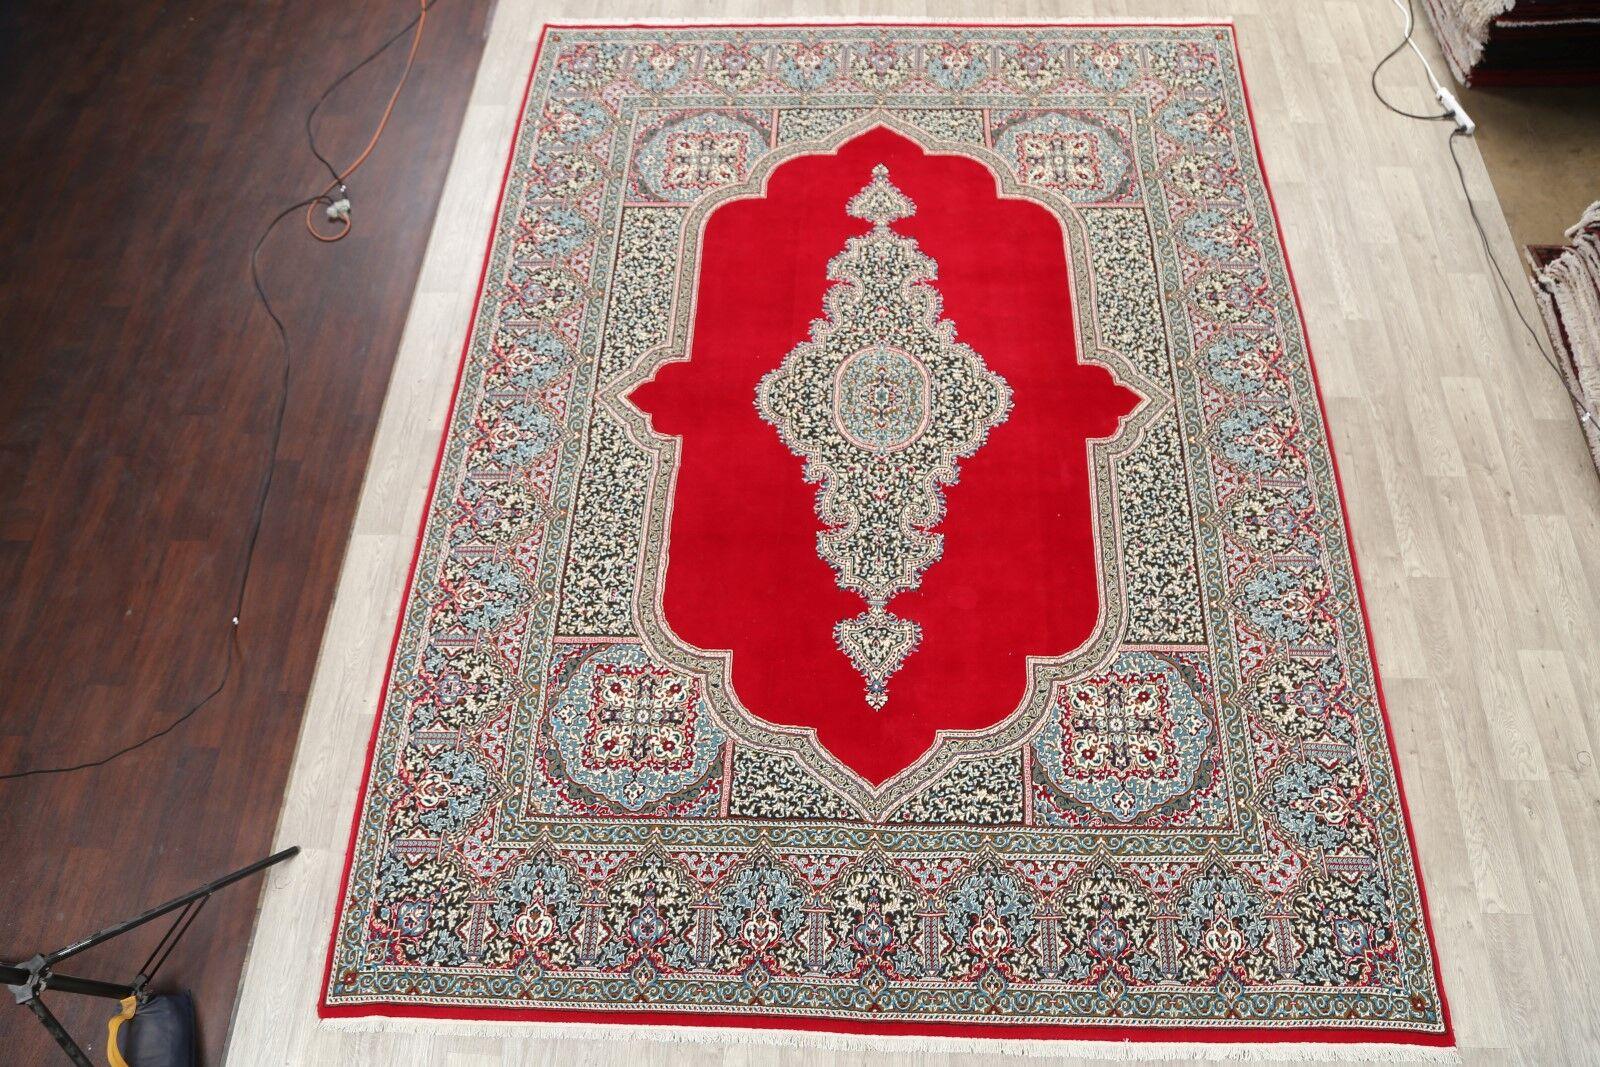 Floral Soft Plush Kerman Persian Red/Gray Area Rug